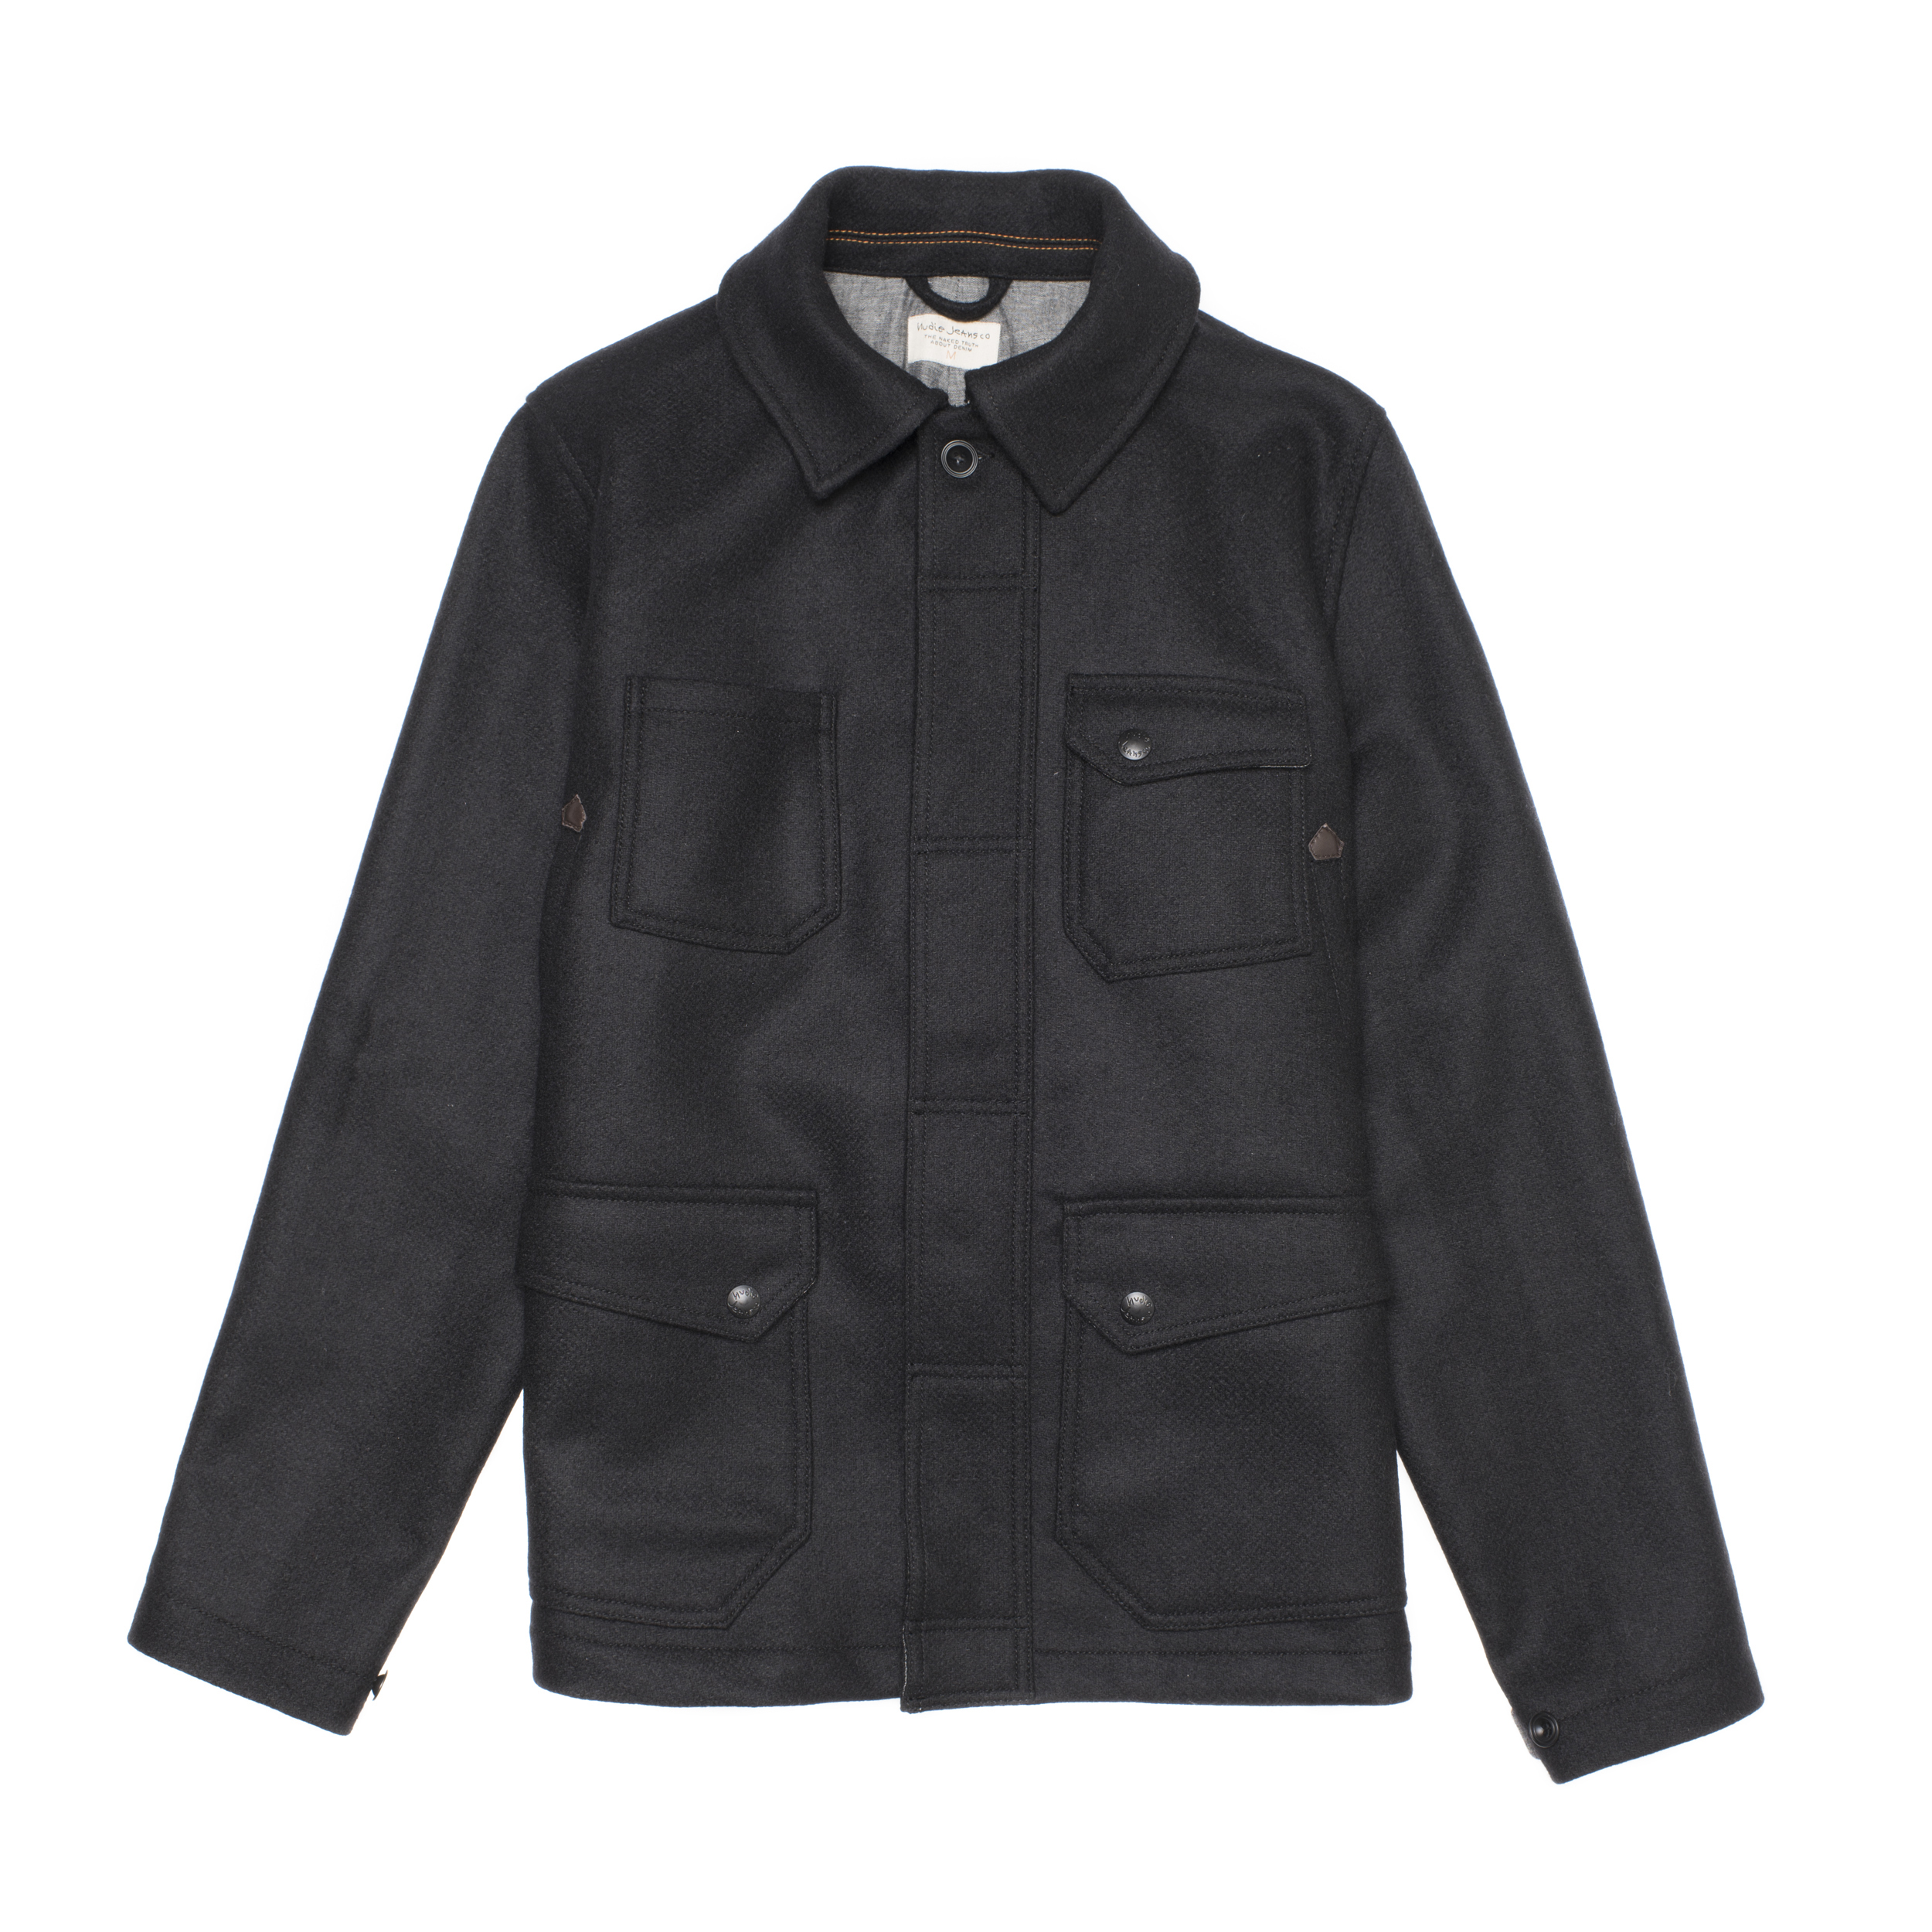 Ethan Wool Jacket 160397_01.2